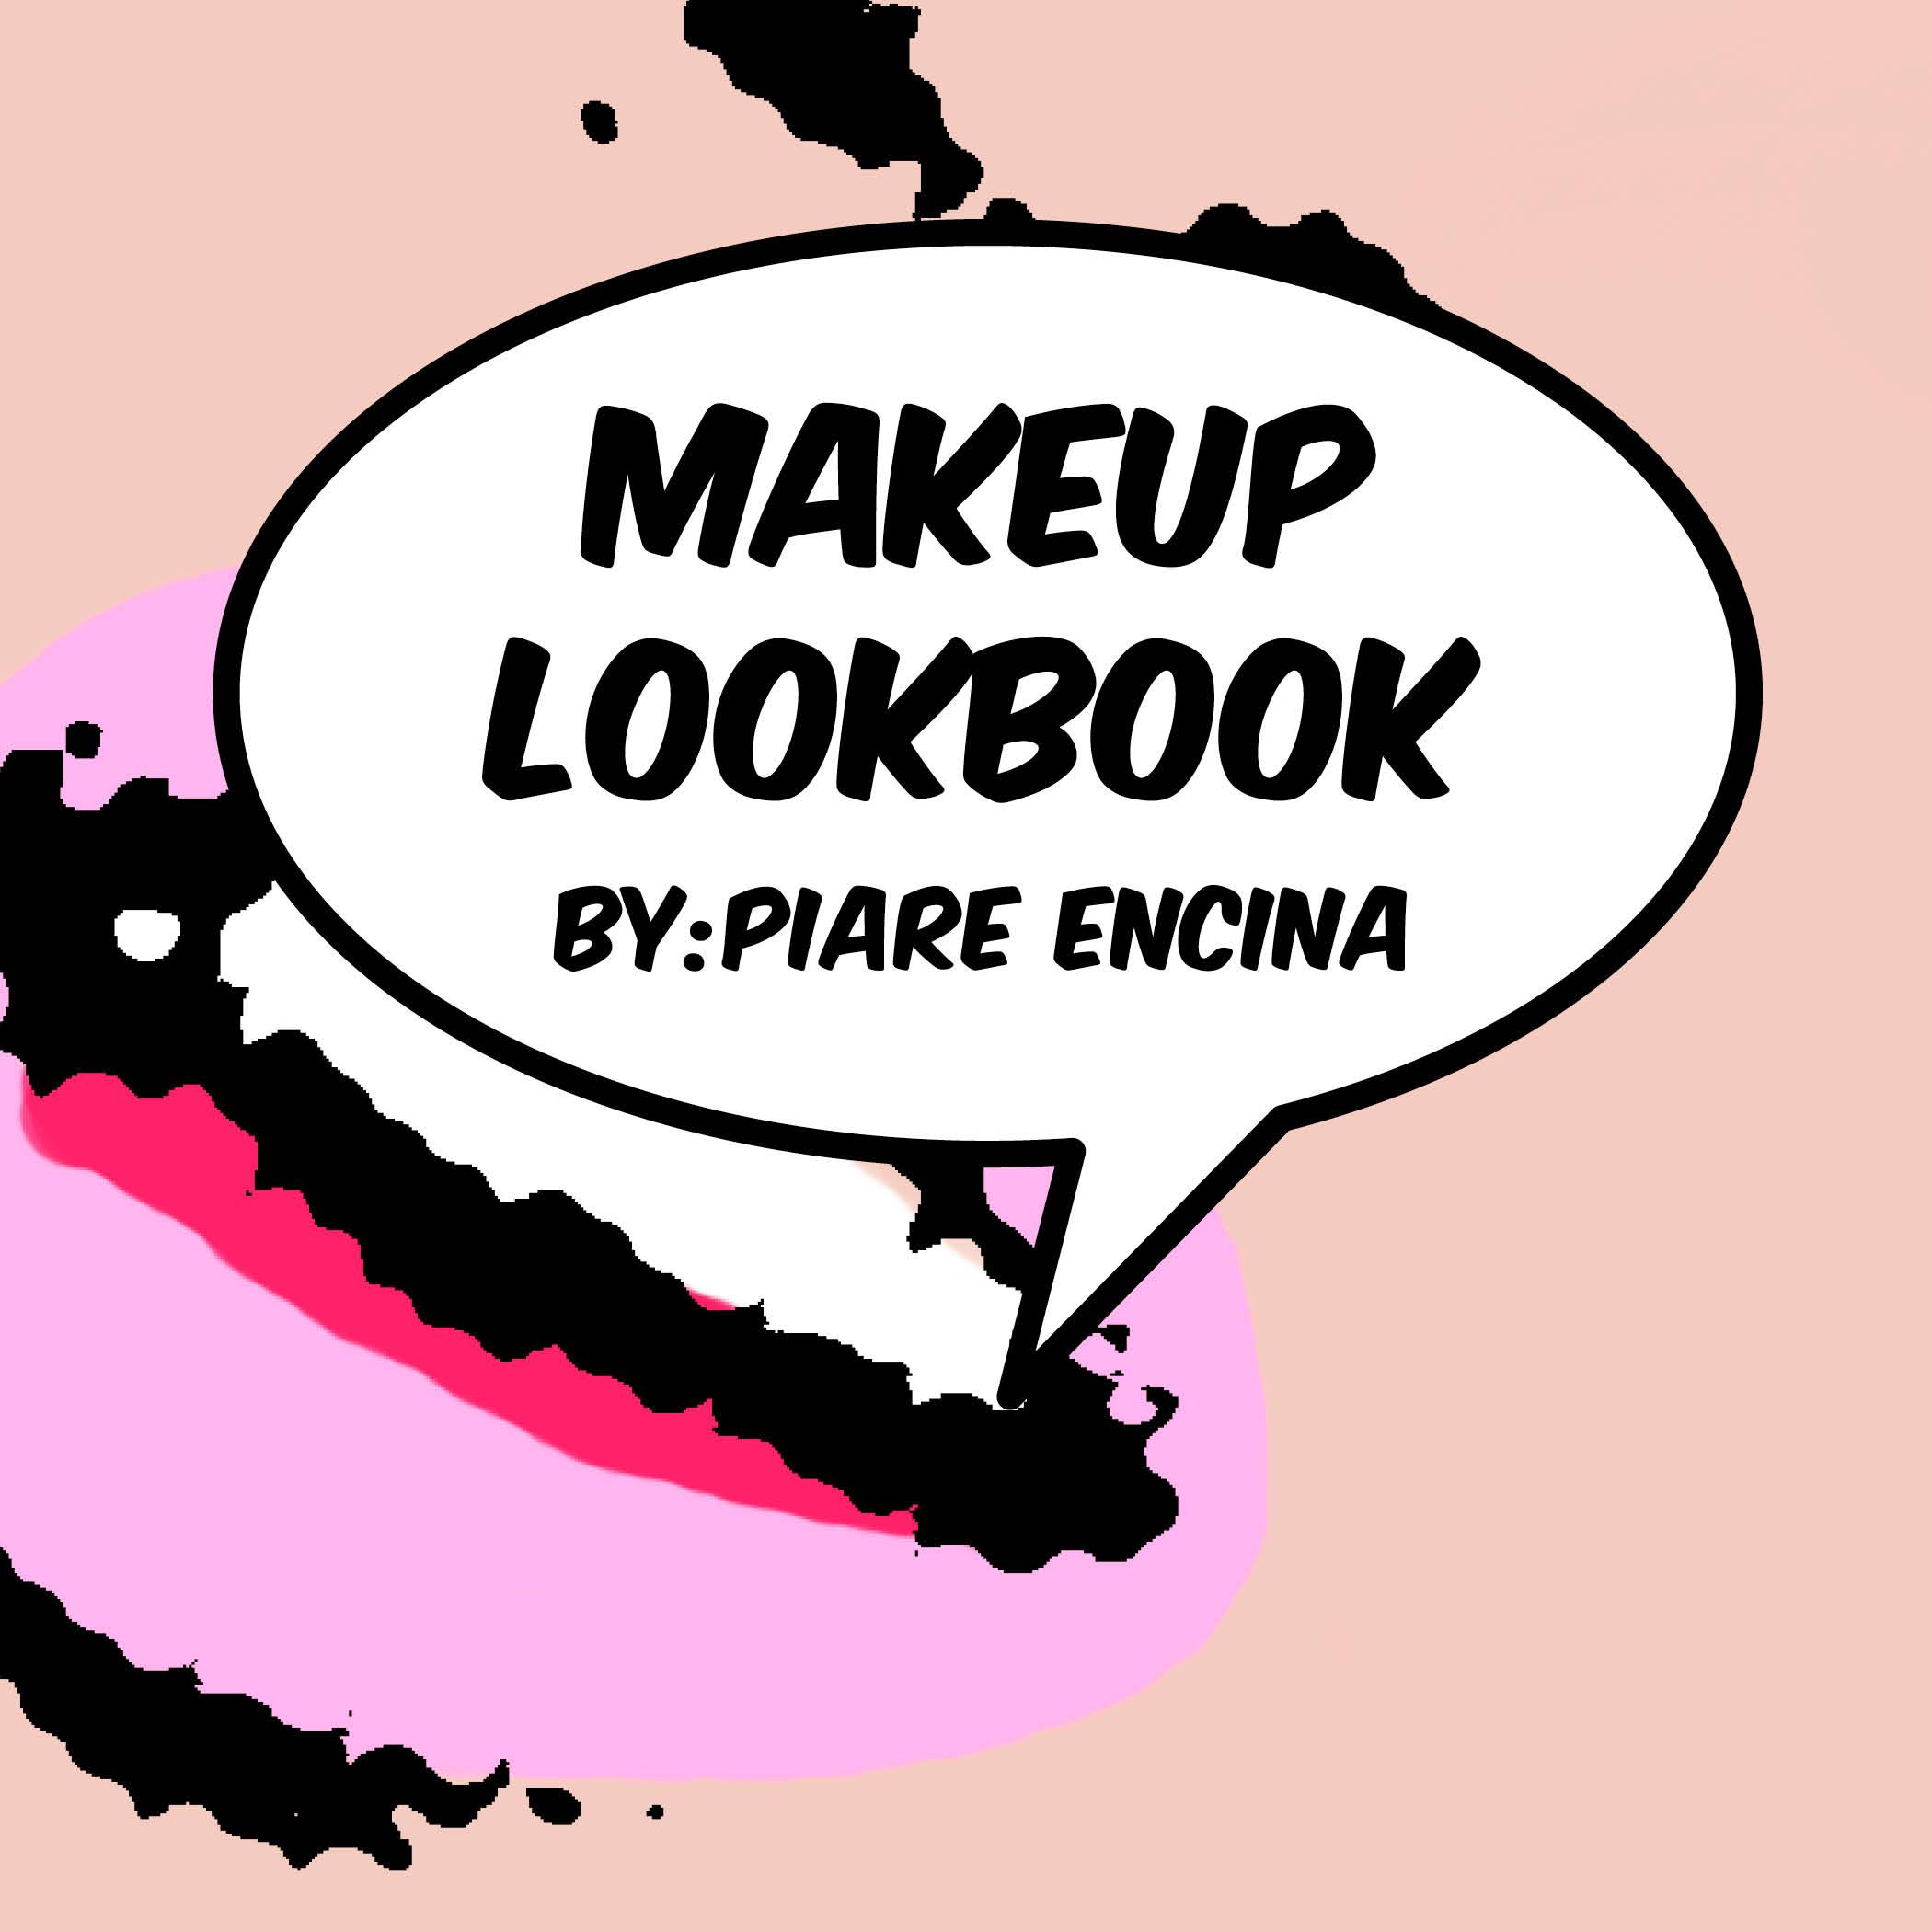 Makeup_lookbook_piare.jpg